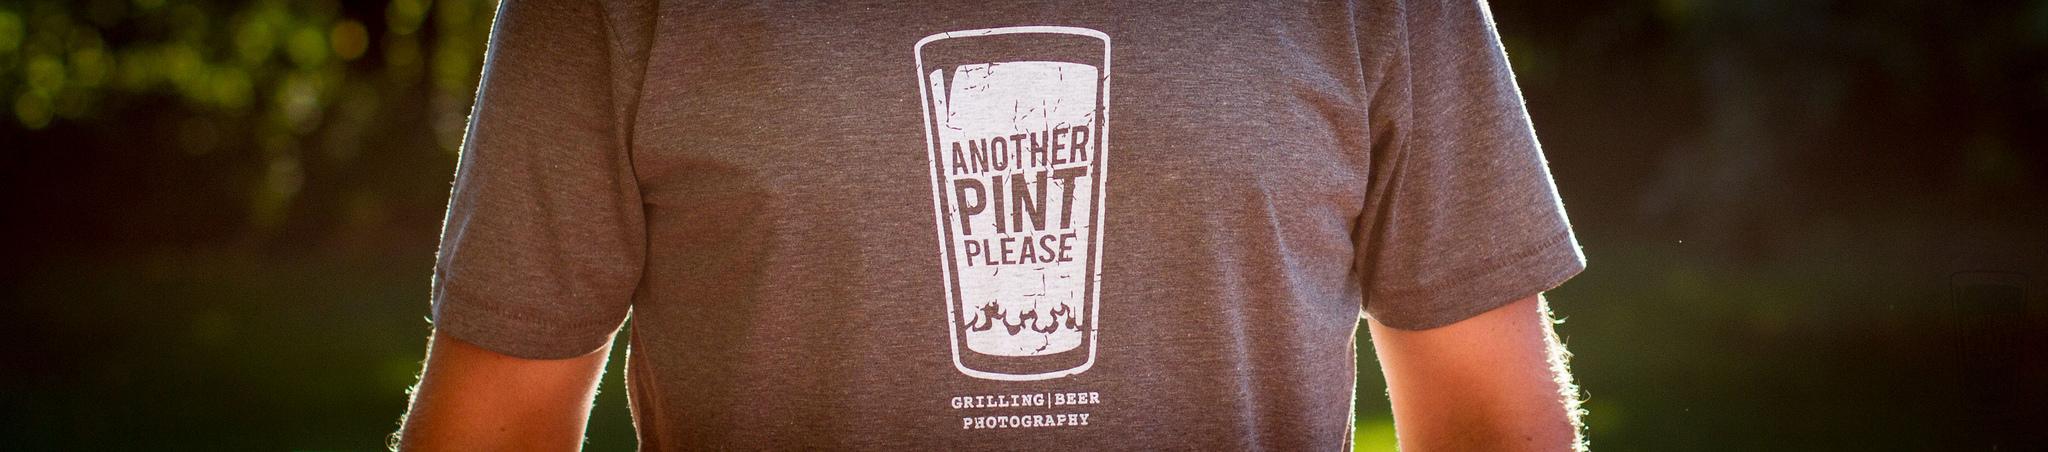 another pint please t-shirt.jpg